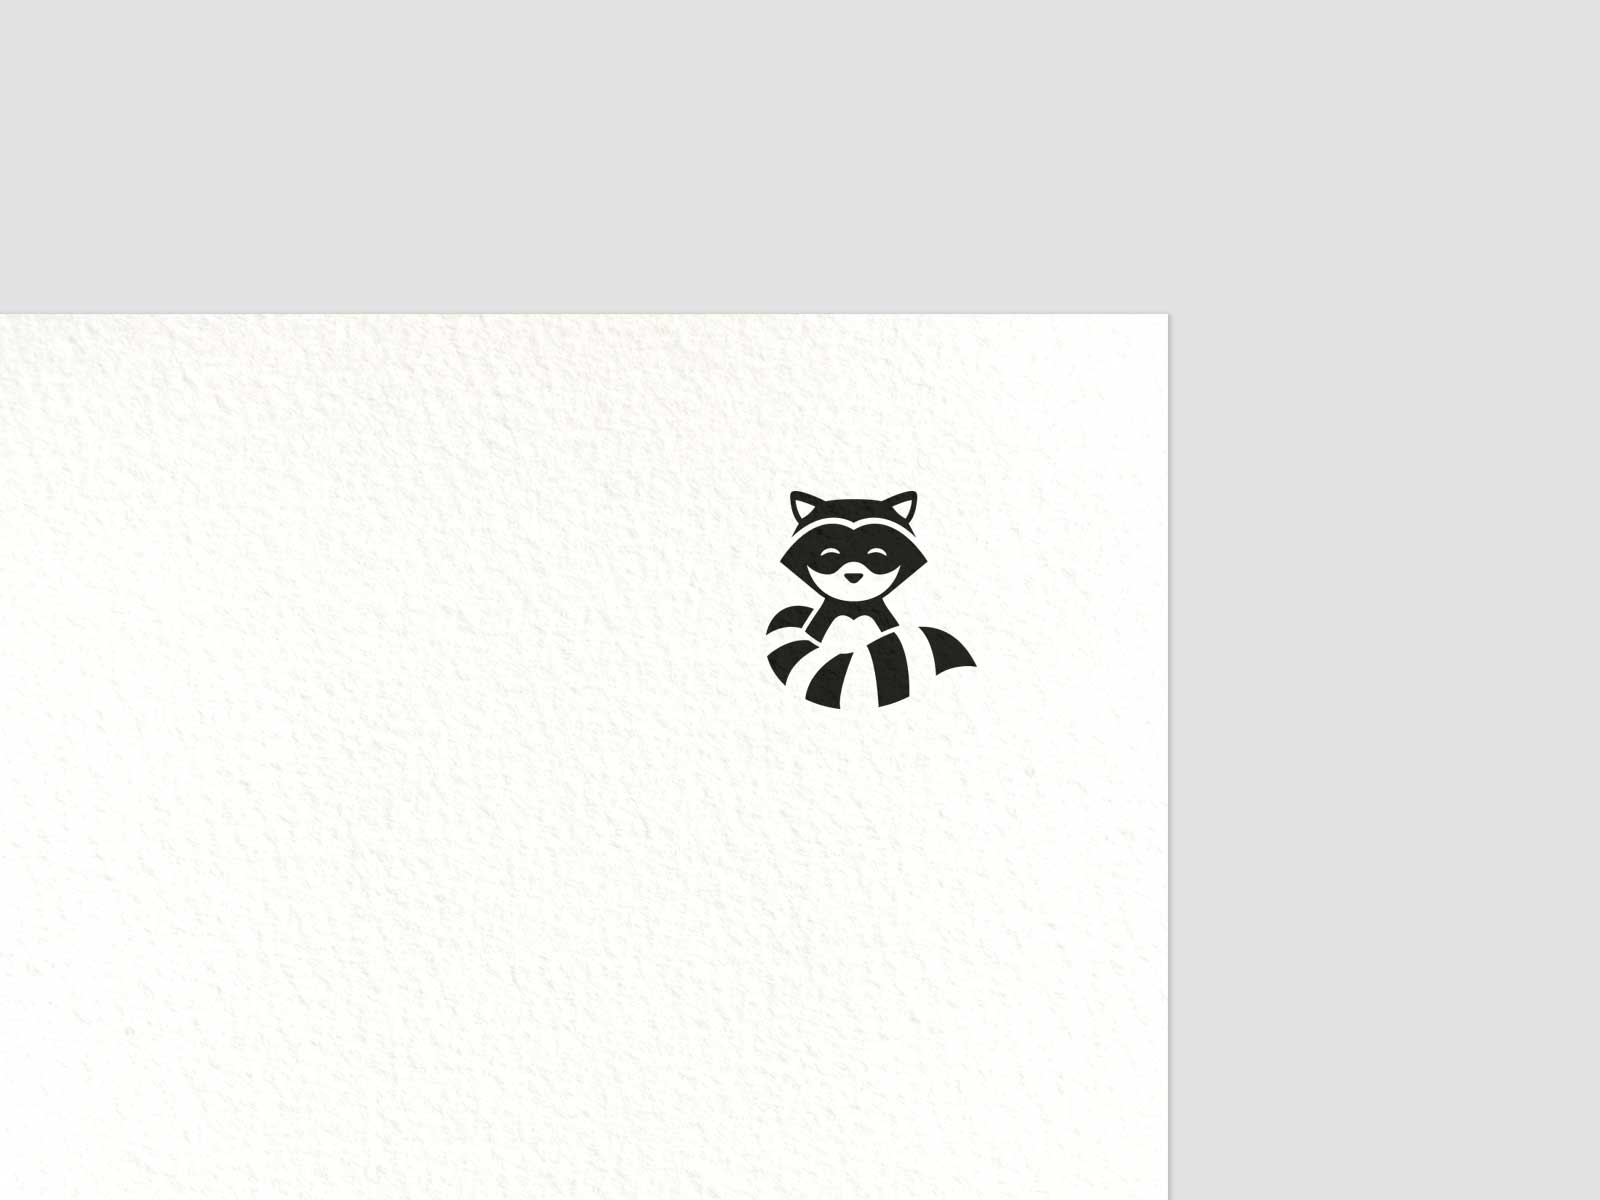 Chillhop mascot raccoon character new logo branding